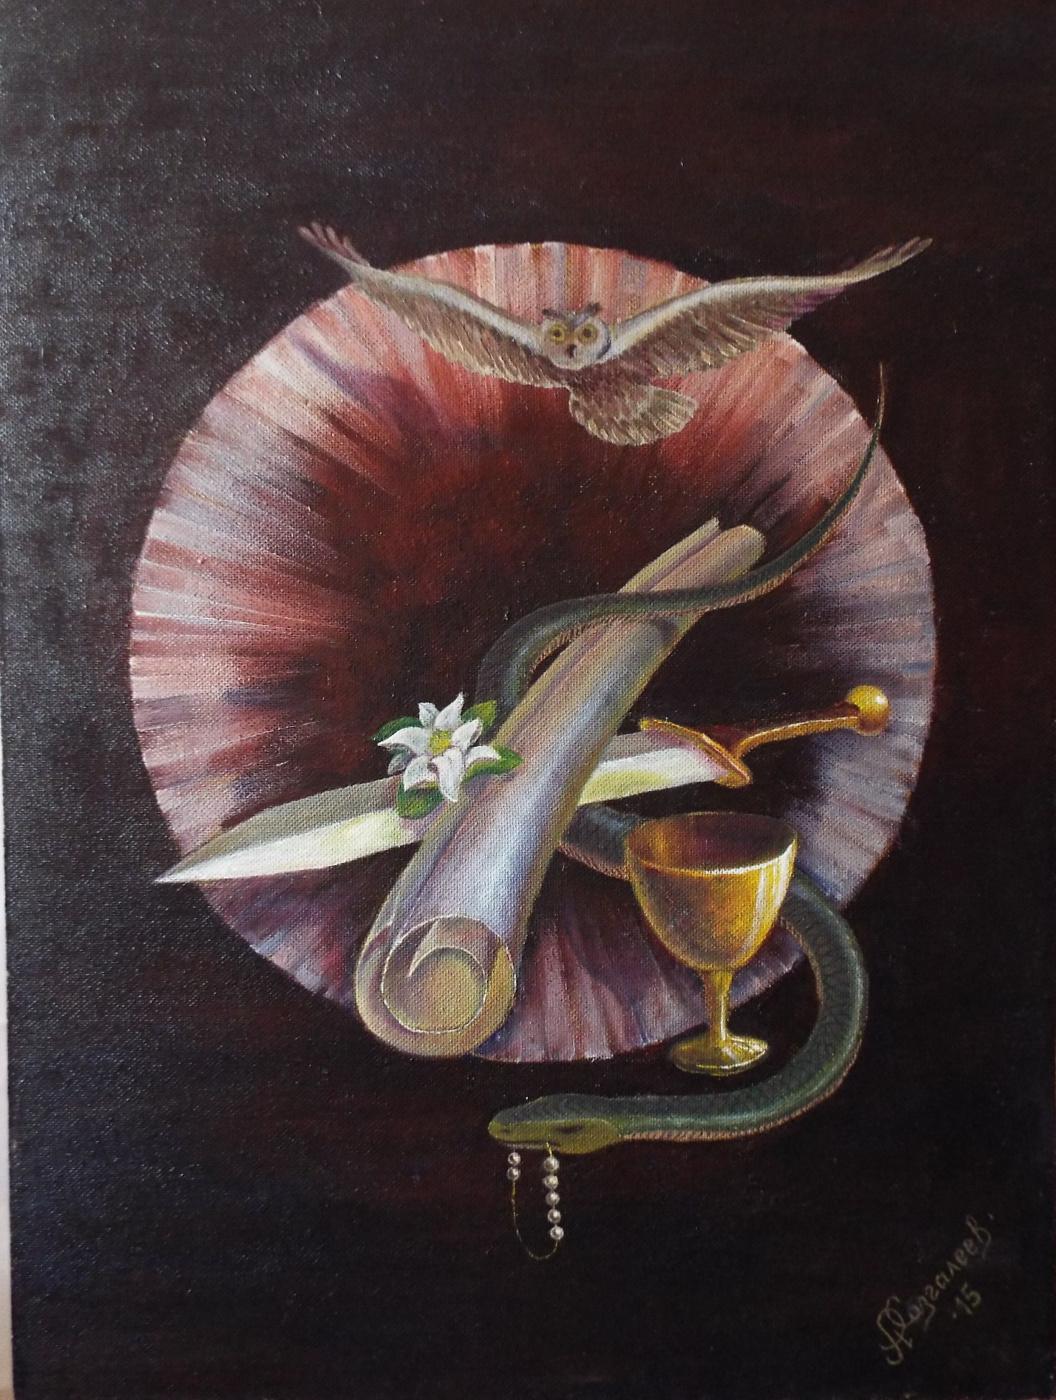 Alik Khazgaleev. The path of the snake (the path to wisdom)